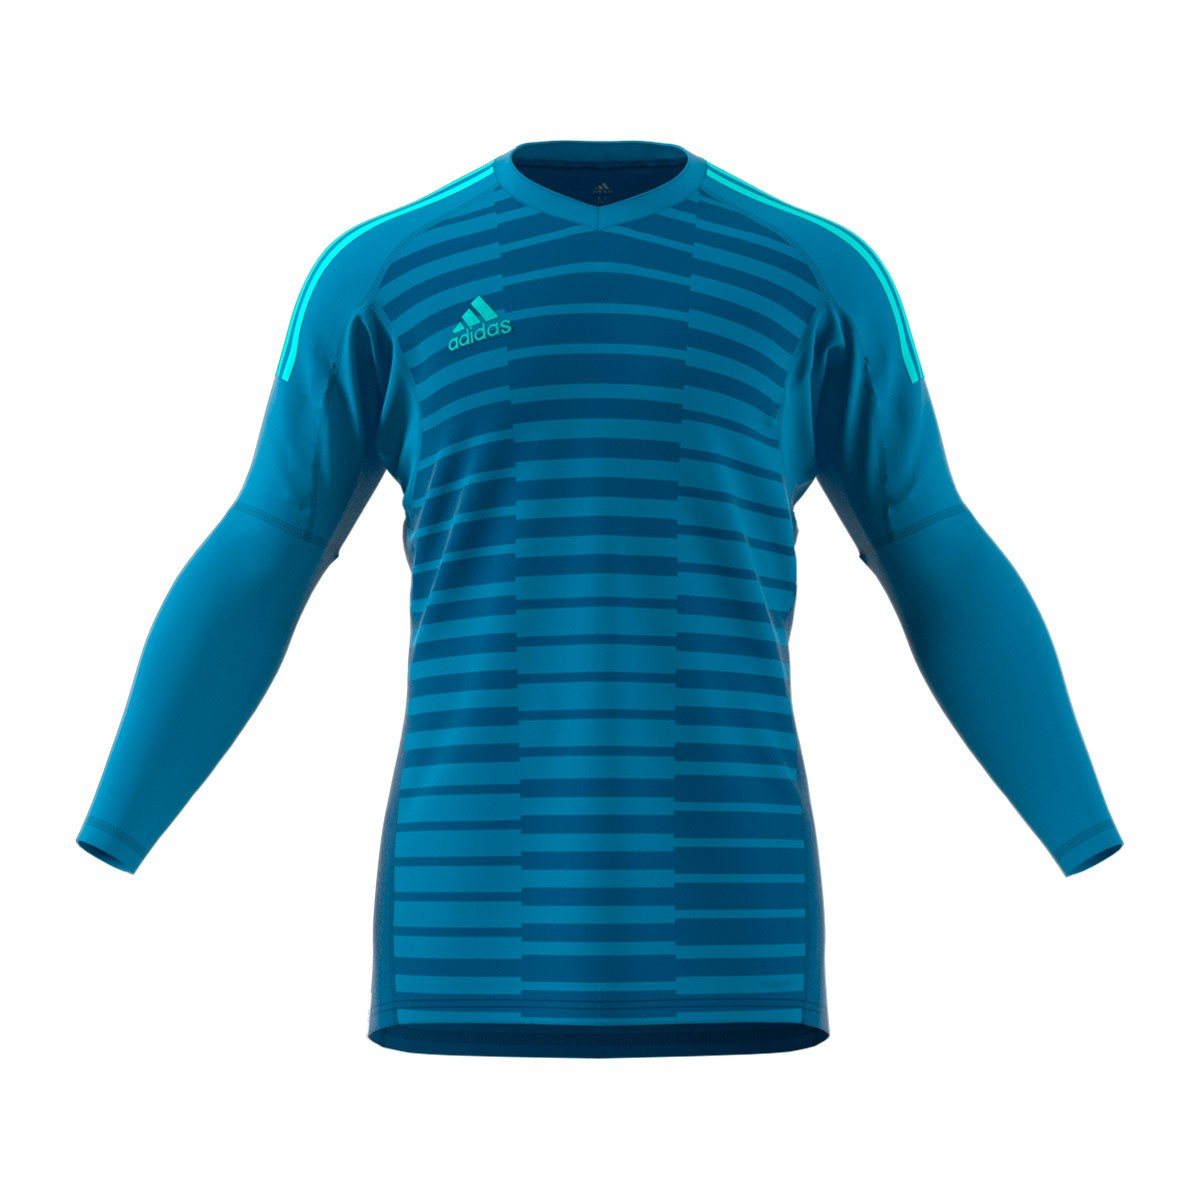 32f82304da0 Jersey adidas AdiPro 18 Goalkeeper Longsleeve Bold aqua-Unity blue-Energy  aqua - Football store Fútbol Emotion